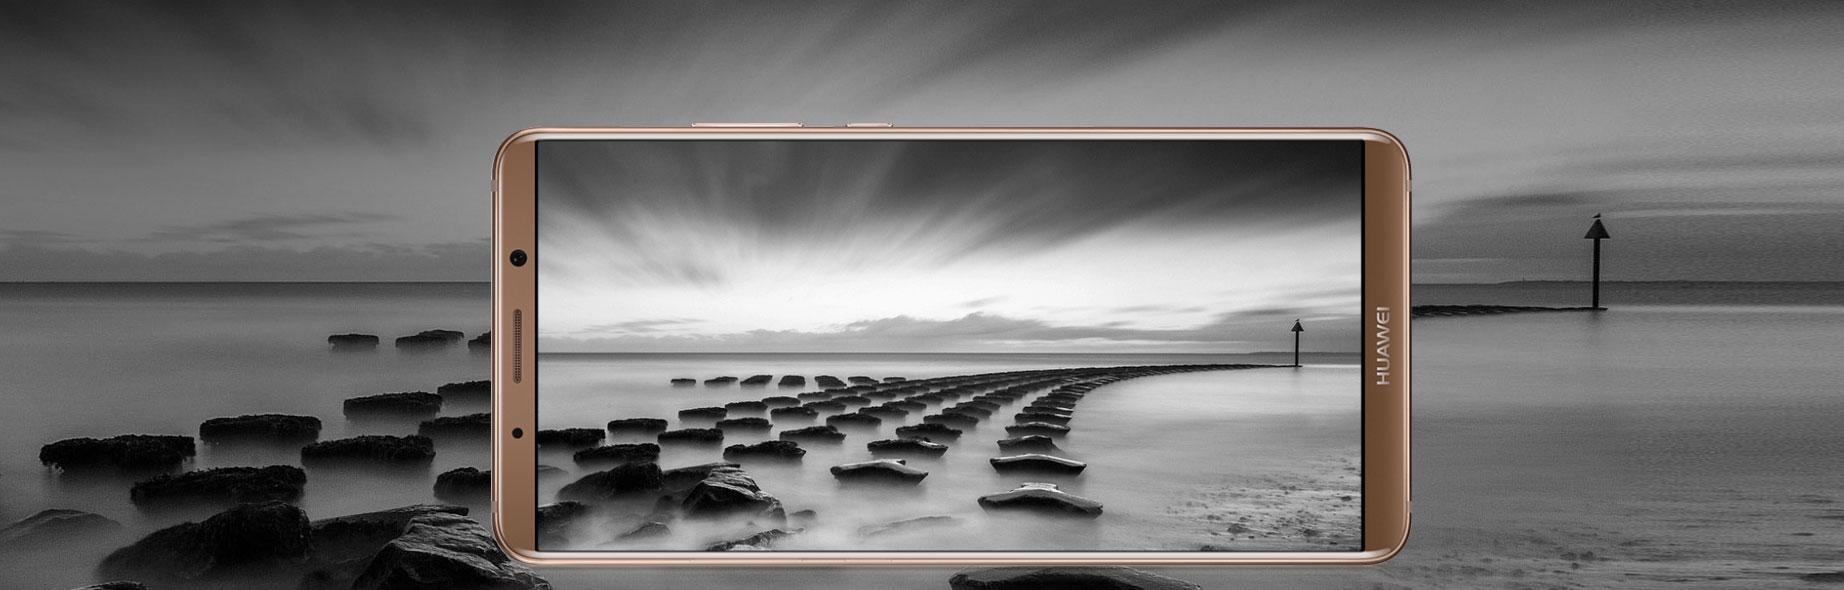 új okostelefon: Huawei Mate 10 Pro